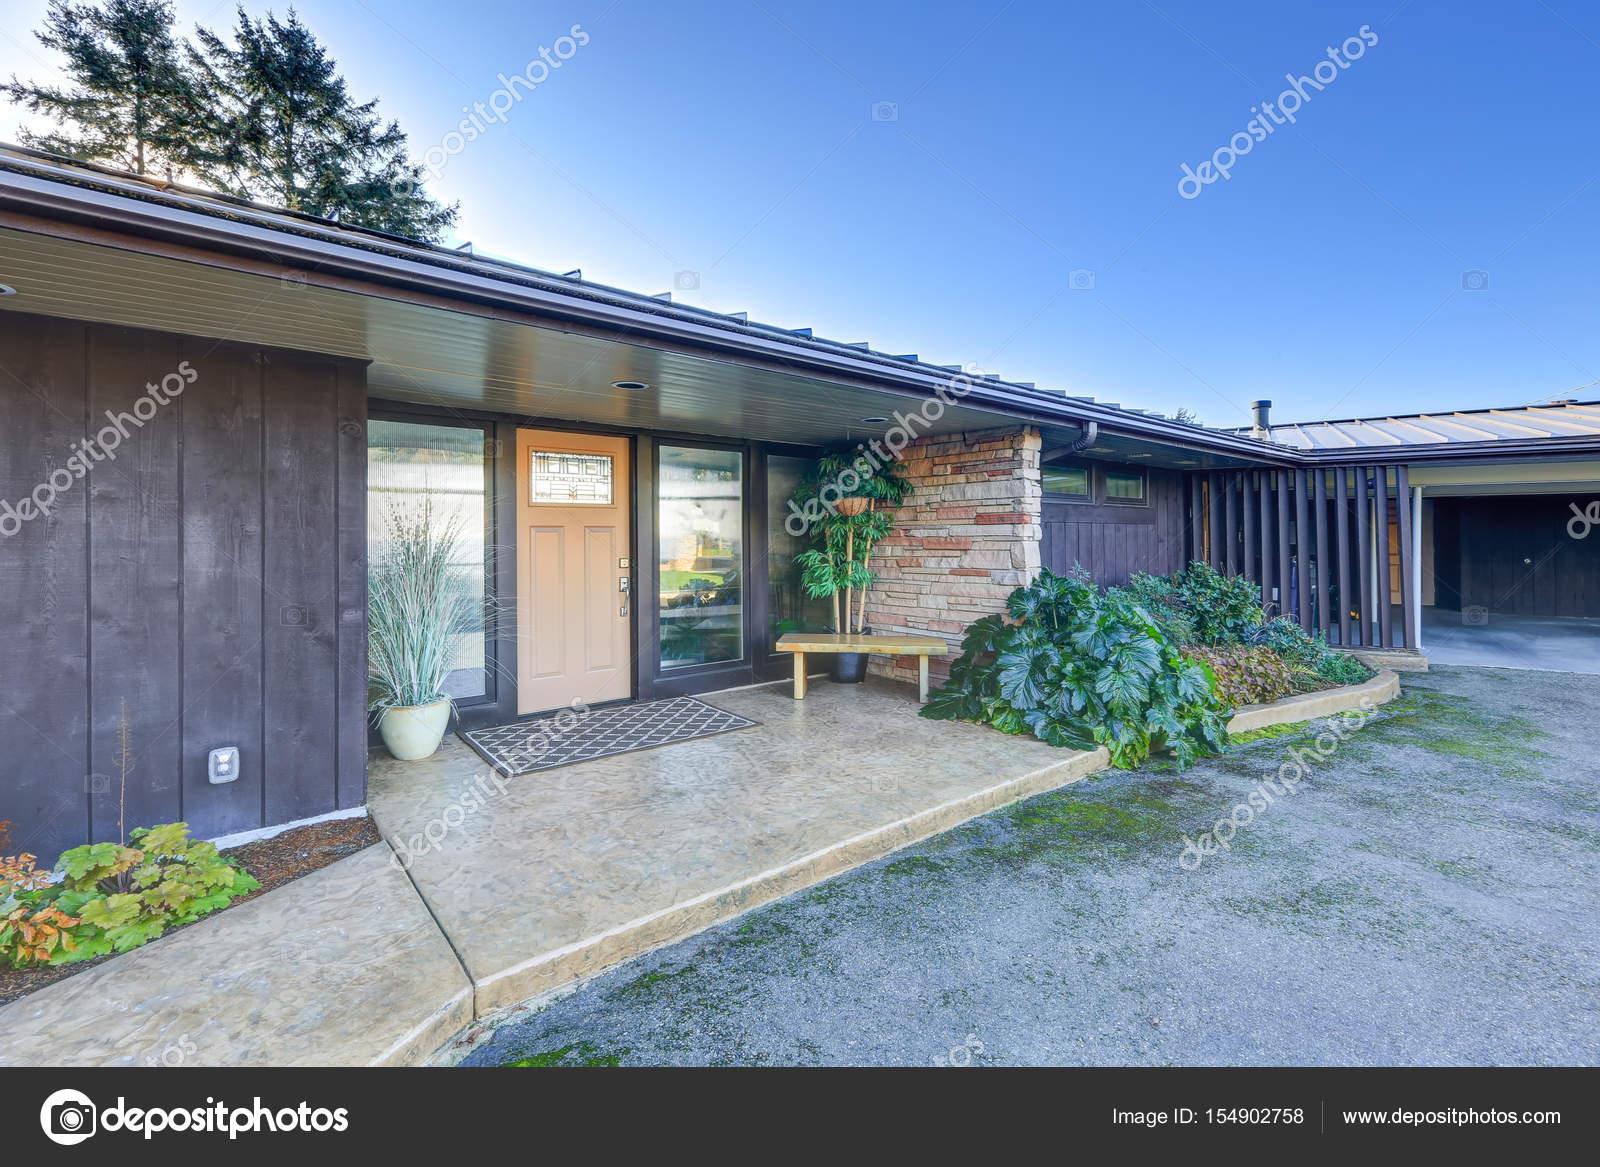 Gezellige veranda met stenen muur u stockfoto iriana w